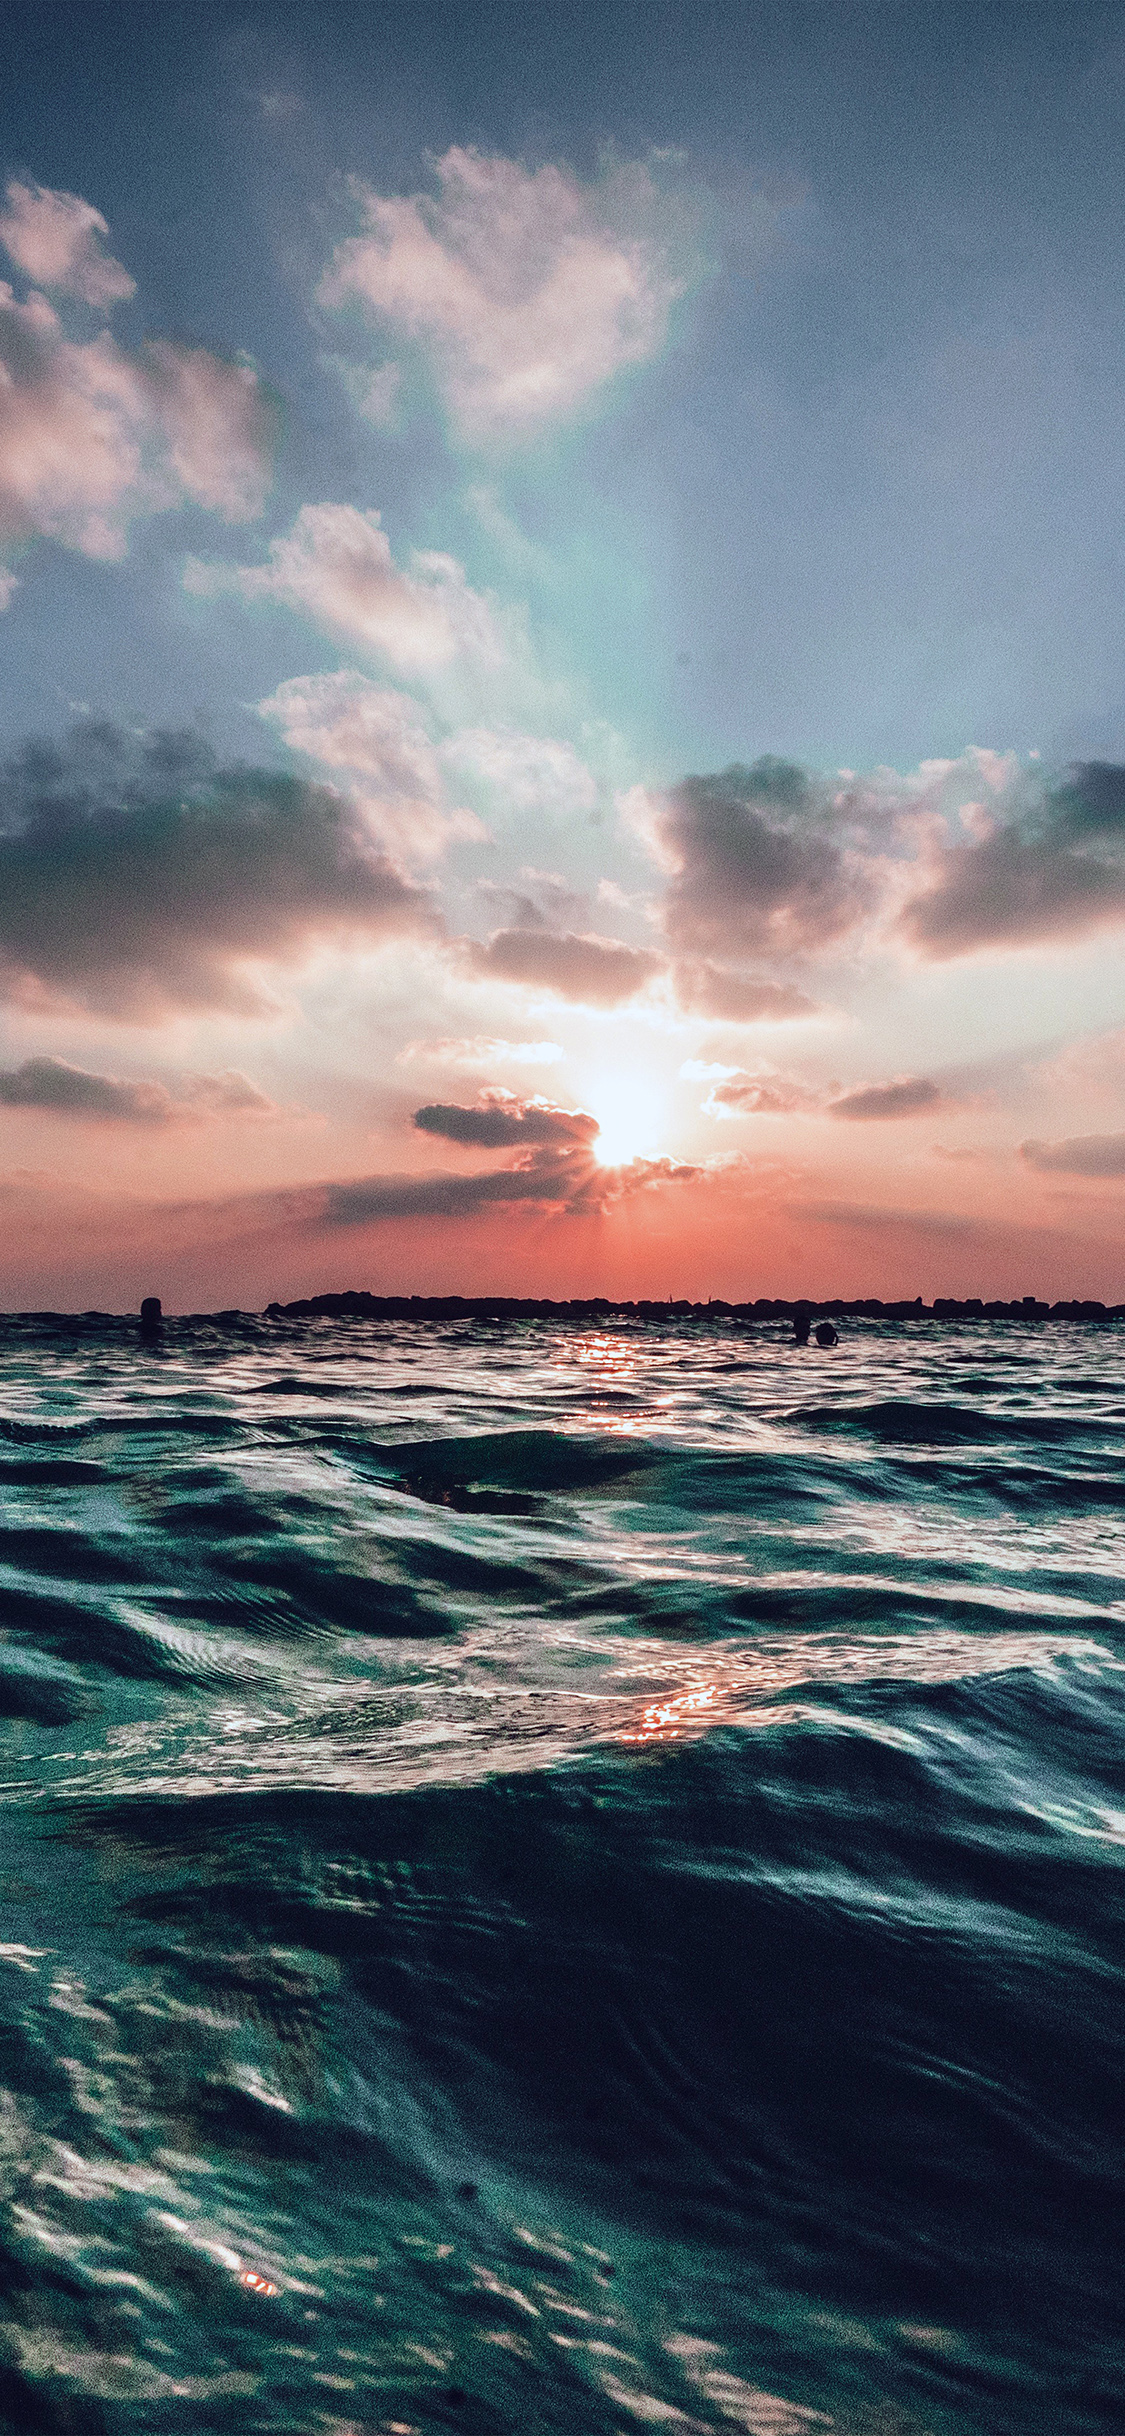 Iphonexpapers Com Iphone X Wallpaper Nf44 Sunset Sea Sky Ocean